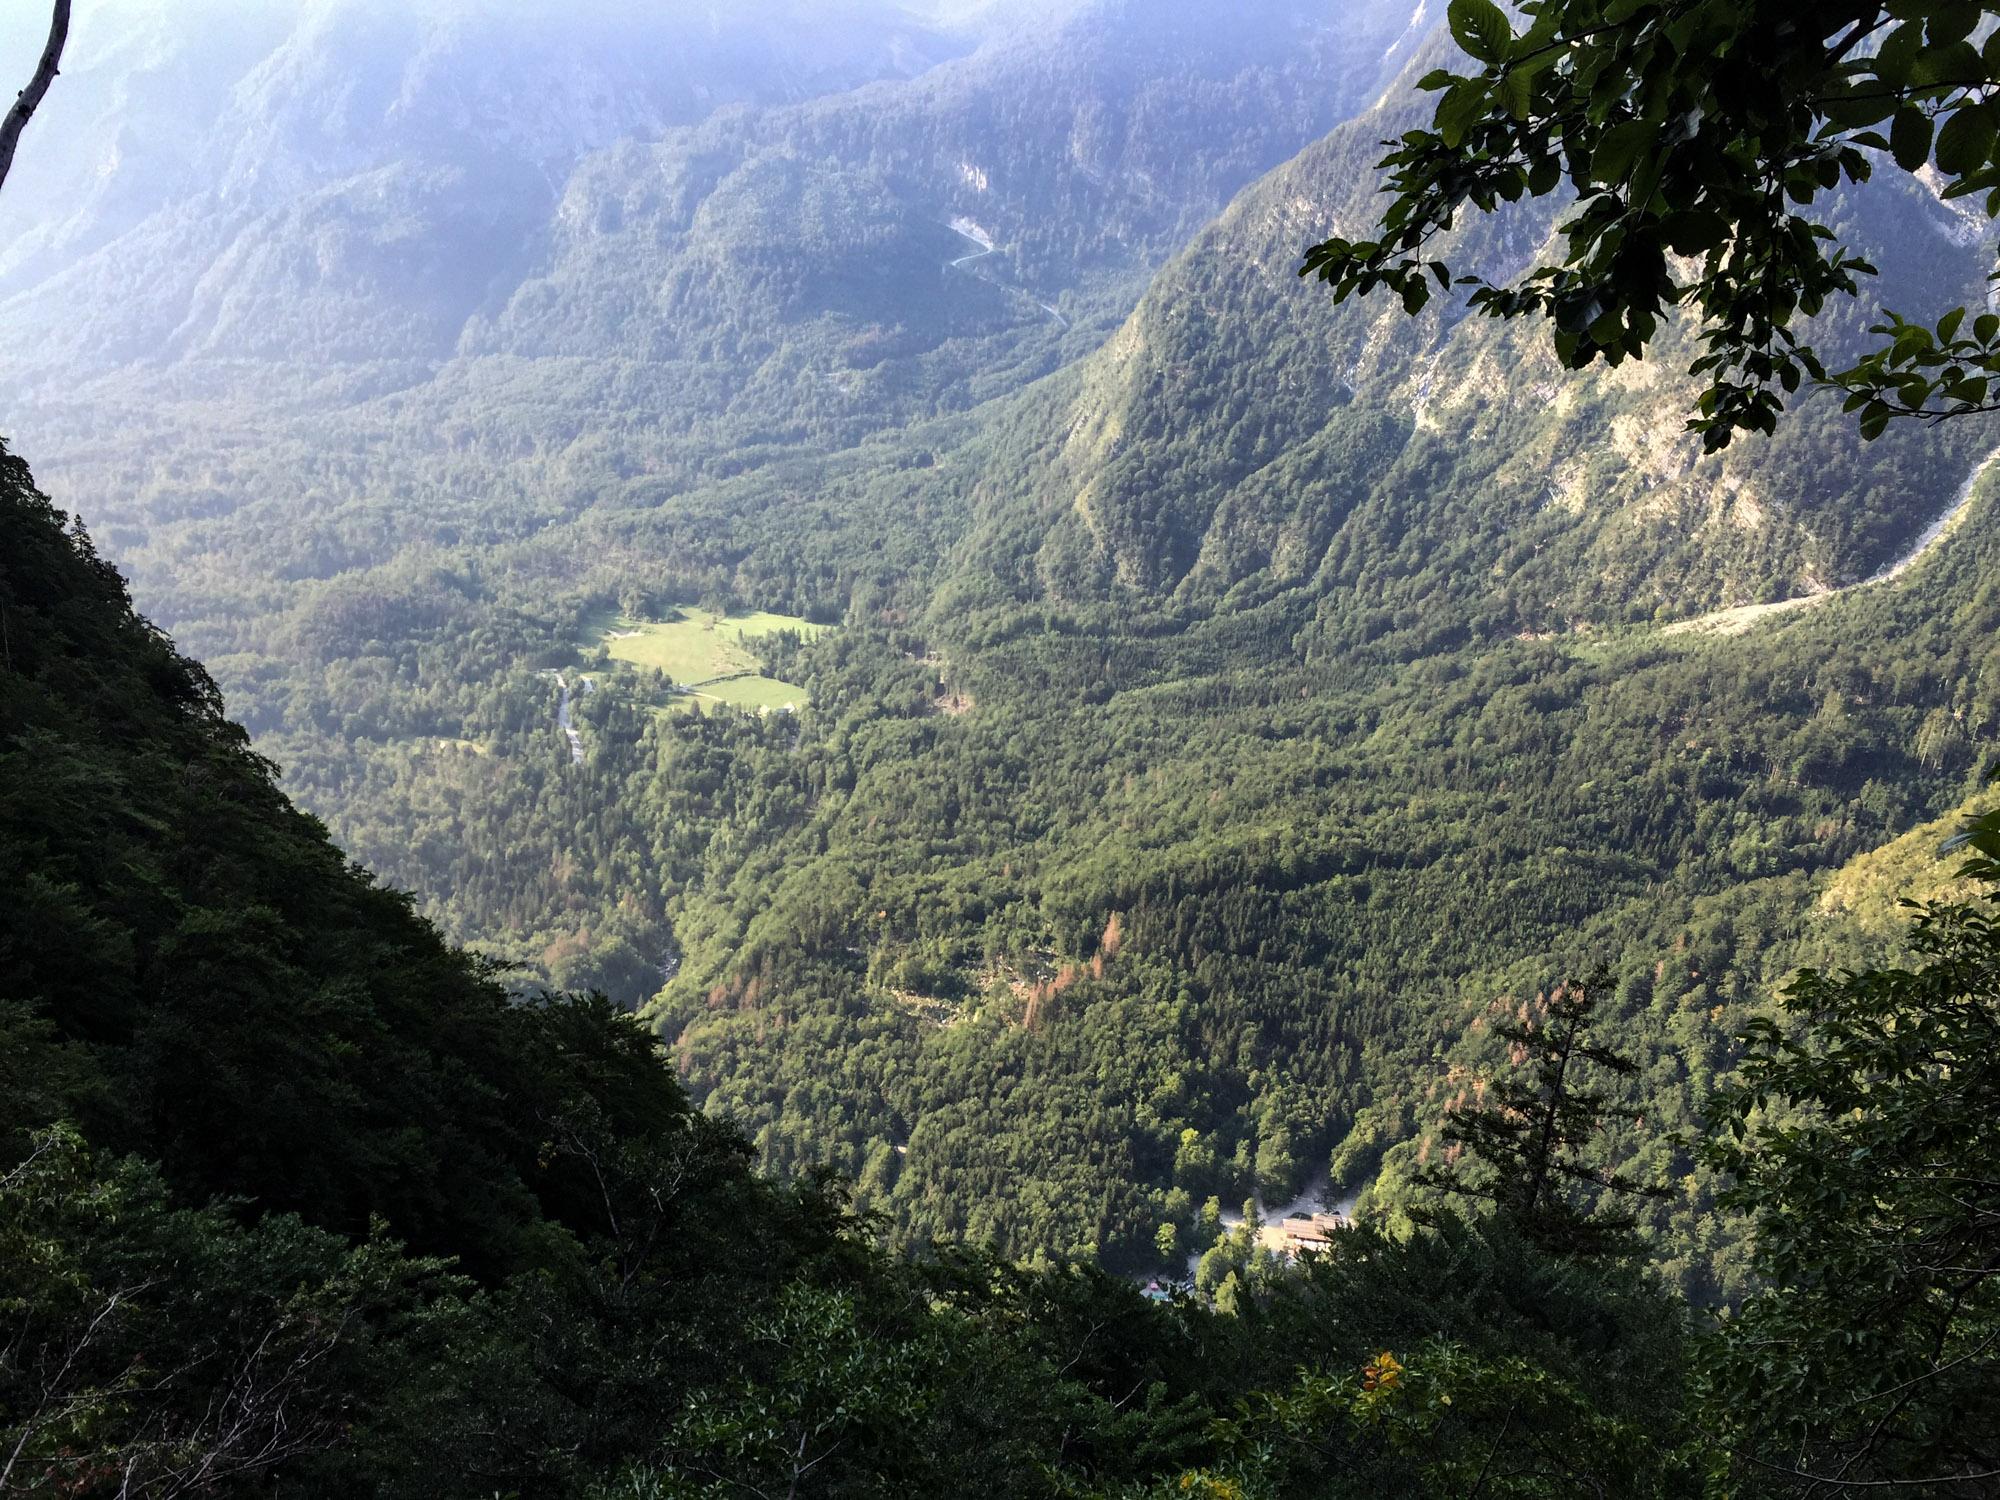 High above Koca pri Savici (bottom right)